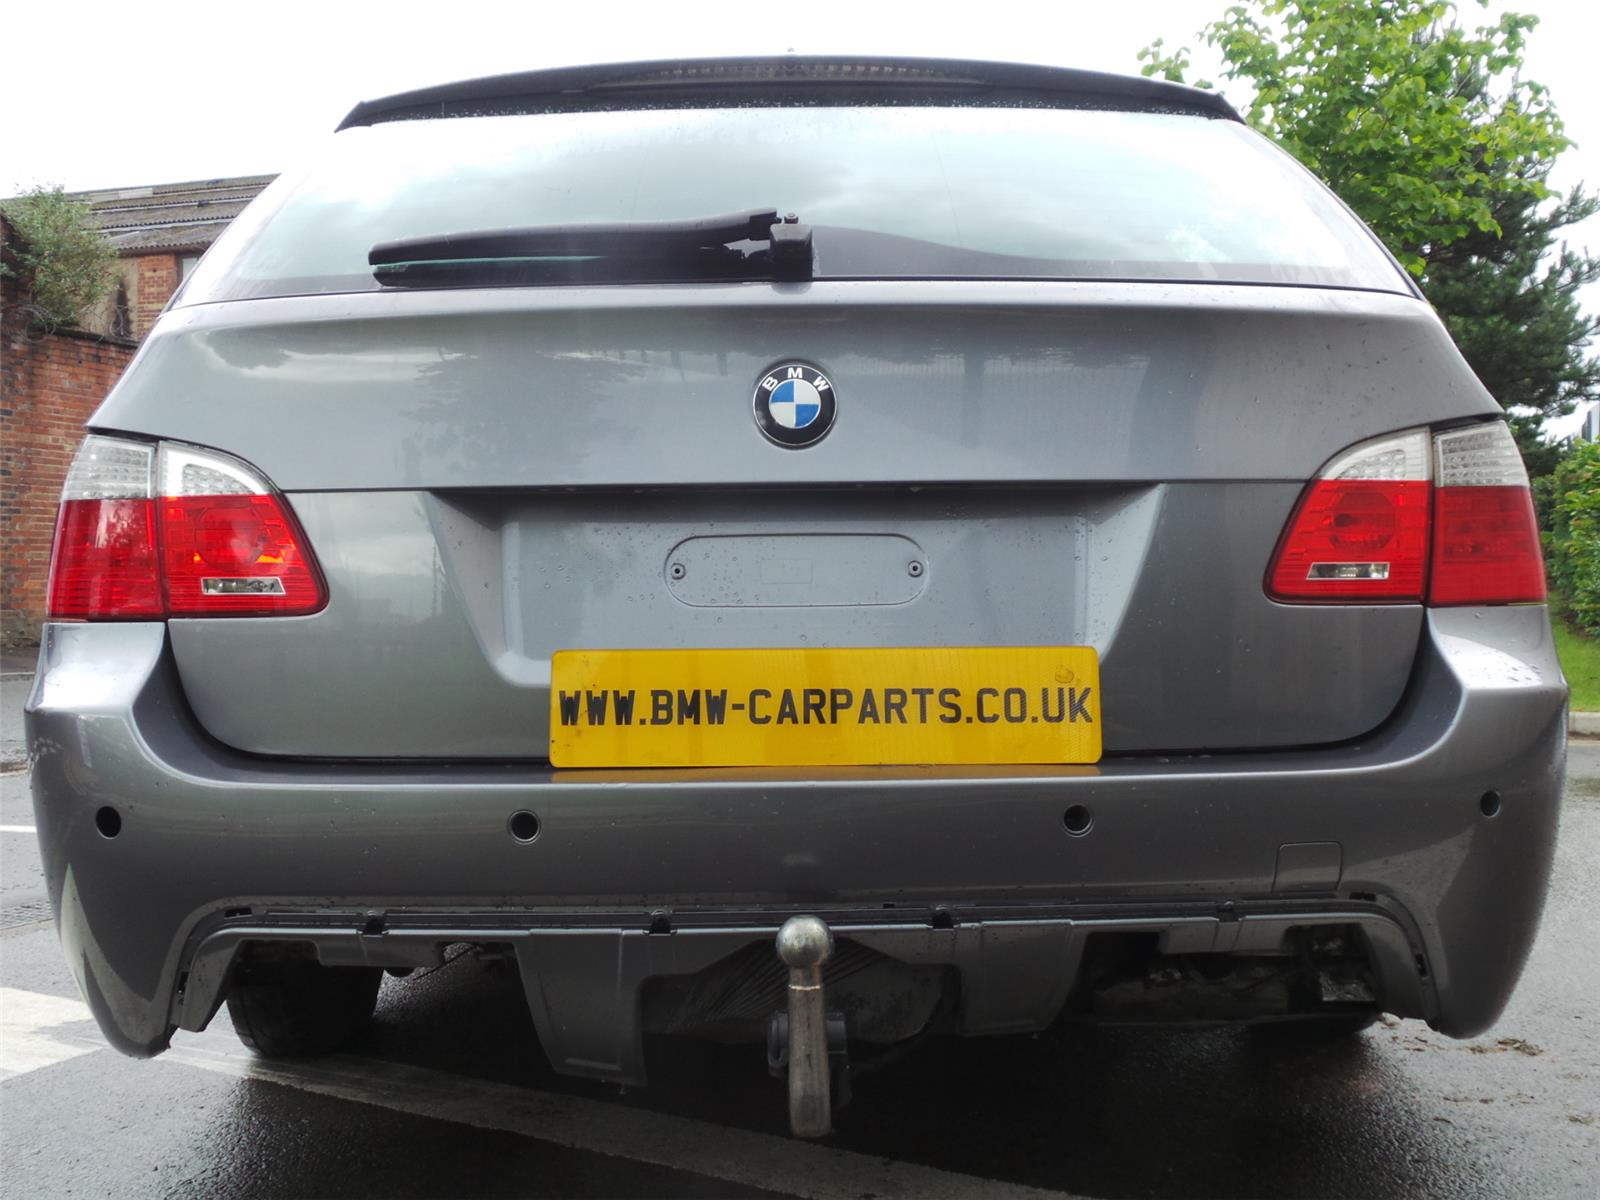 Ireland Car Rental Cheap deals with Sixt rent a car